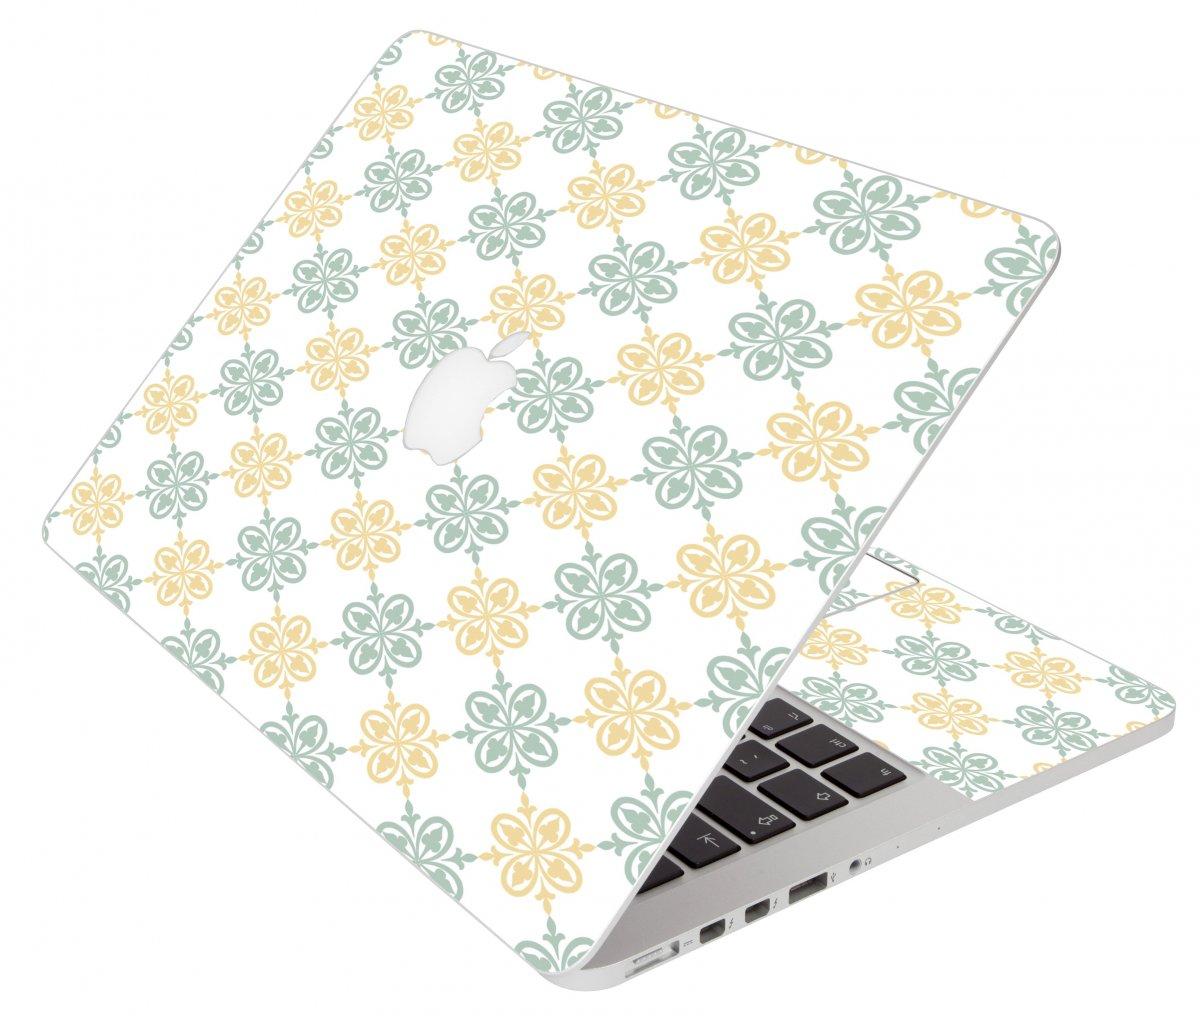 Yellow Green Flowers Apple Macbook Air 11 A1370 Laptop Skin